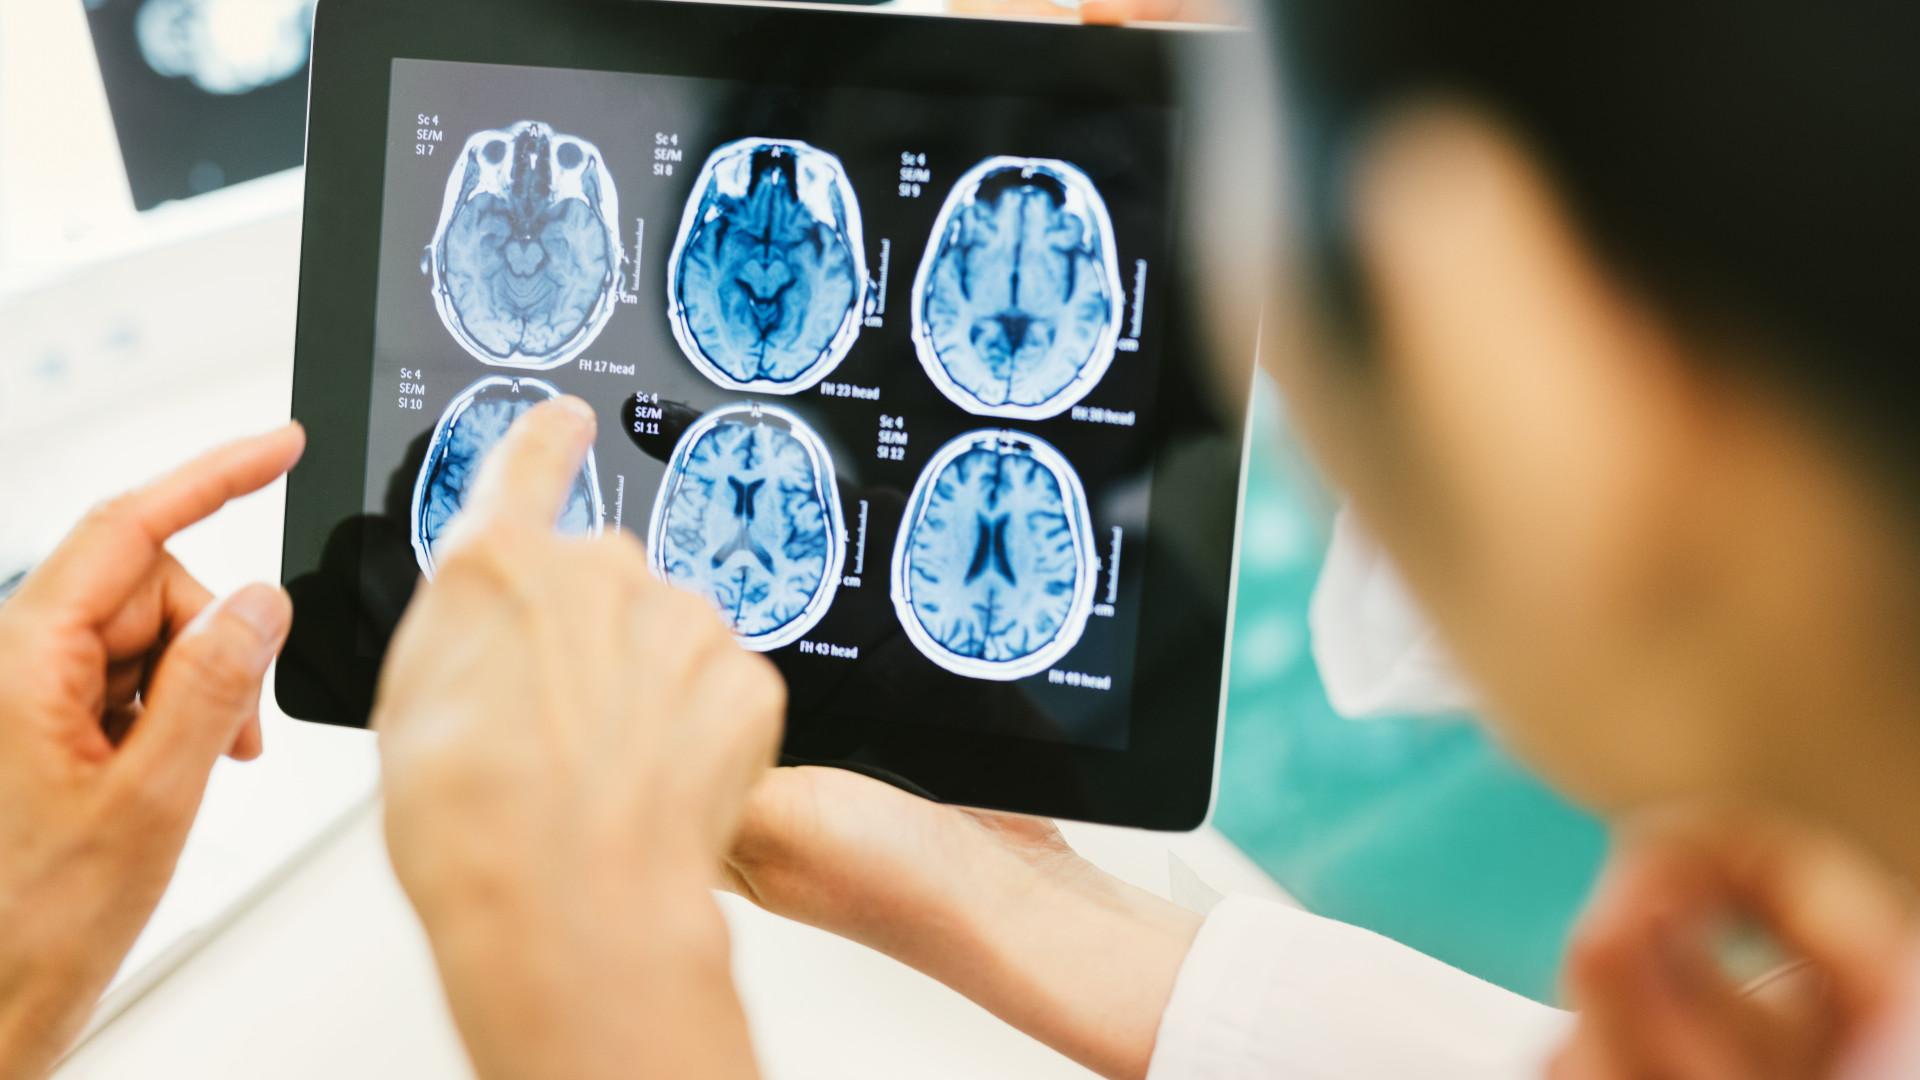 Investigadores descobrem mecanismo que controla tumor maligno no cérebro